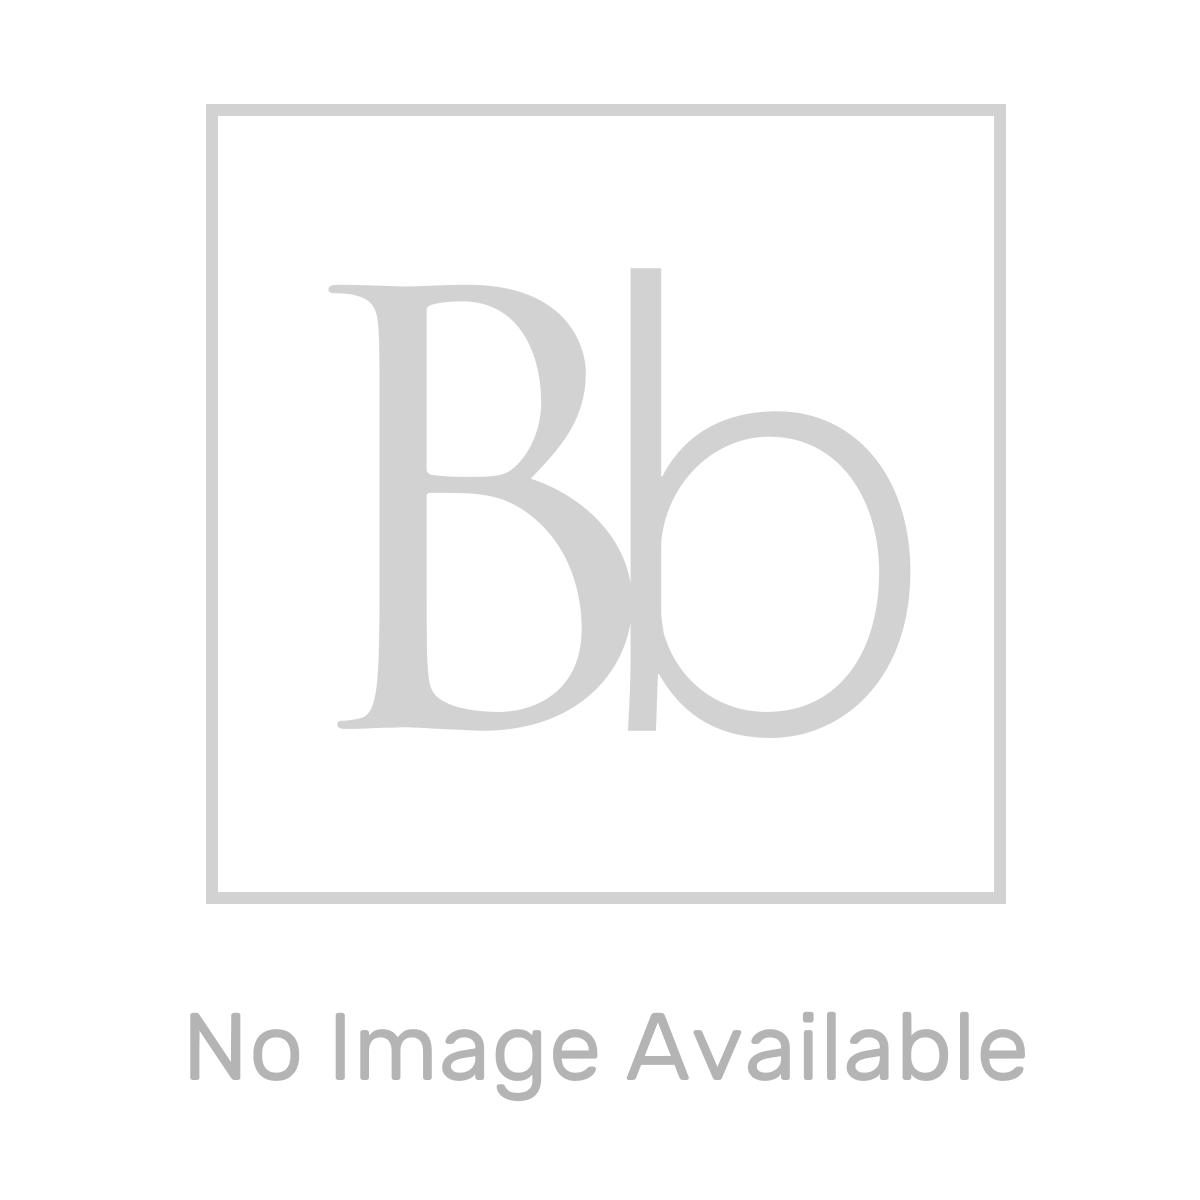 Hudson Reed Quartet 3 Door Mirror Cabinet 1350mm line drawing